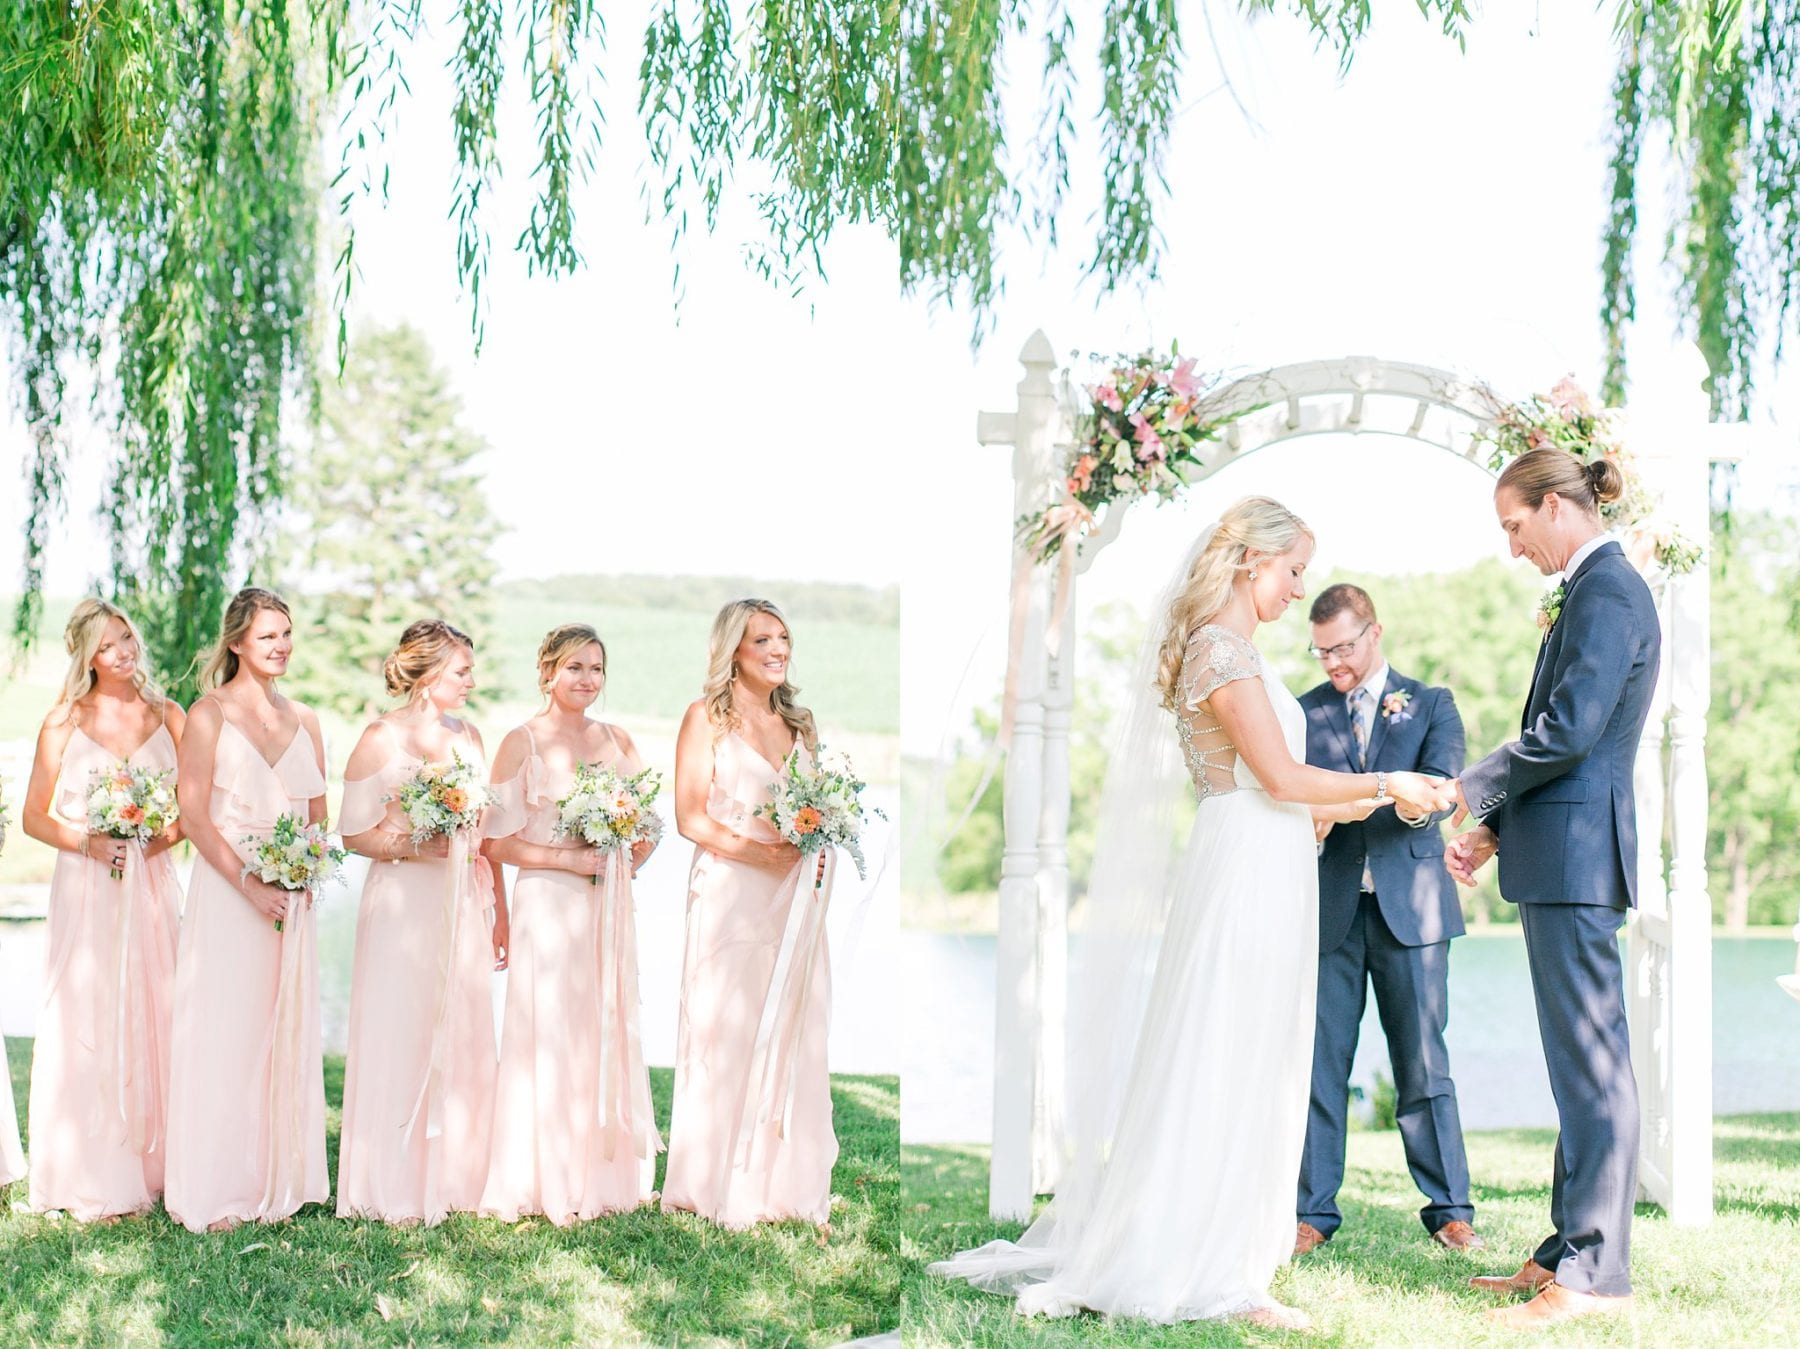 Pond View Farm Wedding Photos Maryland Wedding Photographer Kristen & Ryan Megan Kelsey Photography Blog-122.jpg